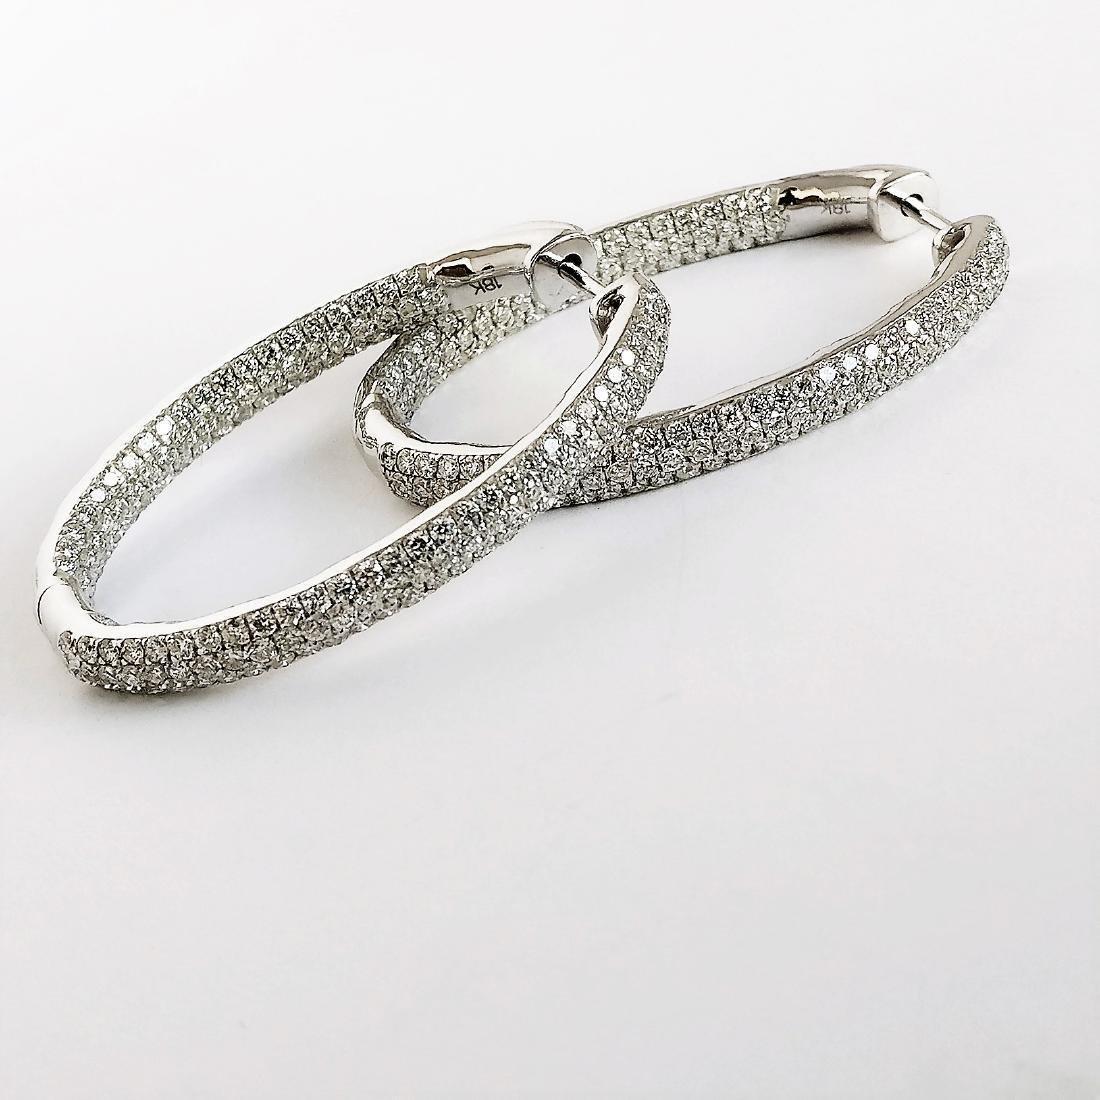 Ladies Earrings with Diamonds total 5.84 ct - 5